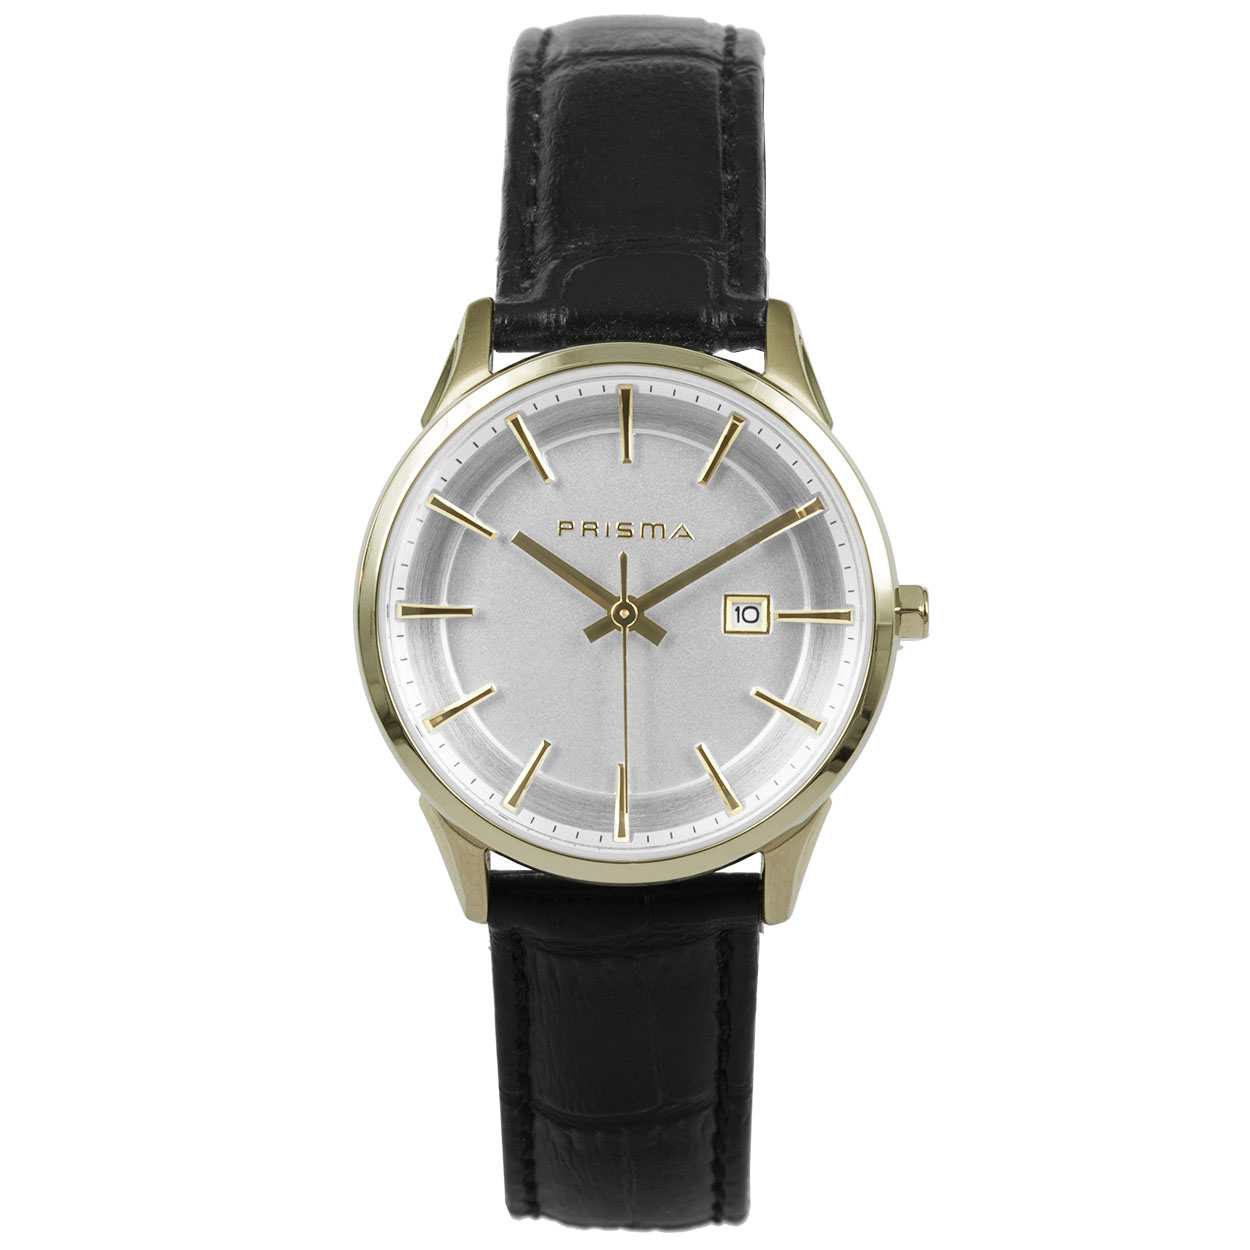 Prisma Stainless Steel Dames horloge P1573 - Leer - Zwart